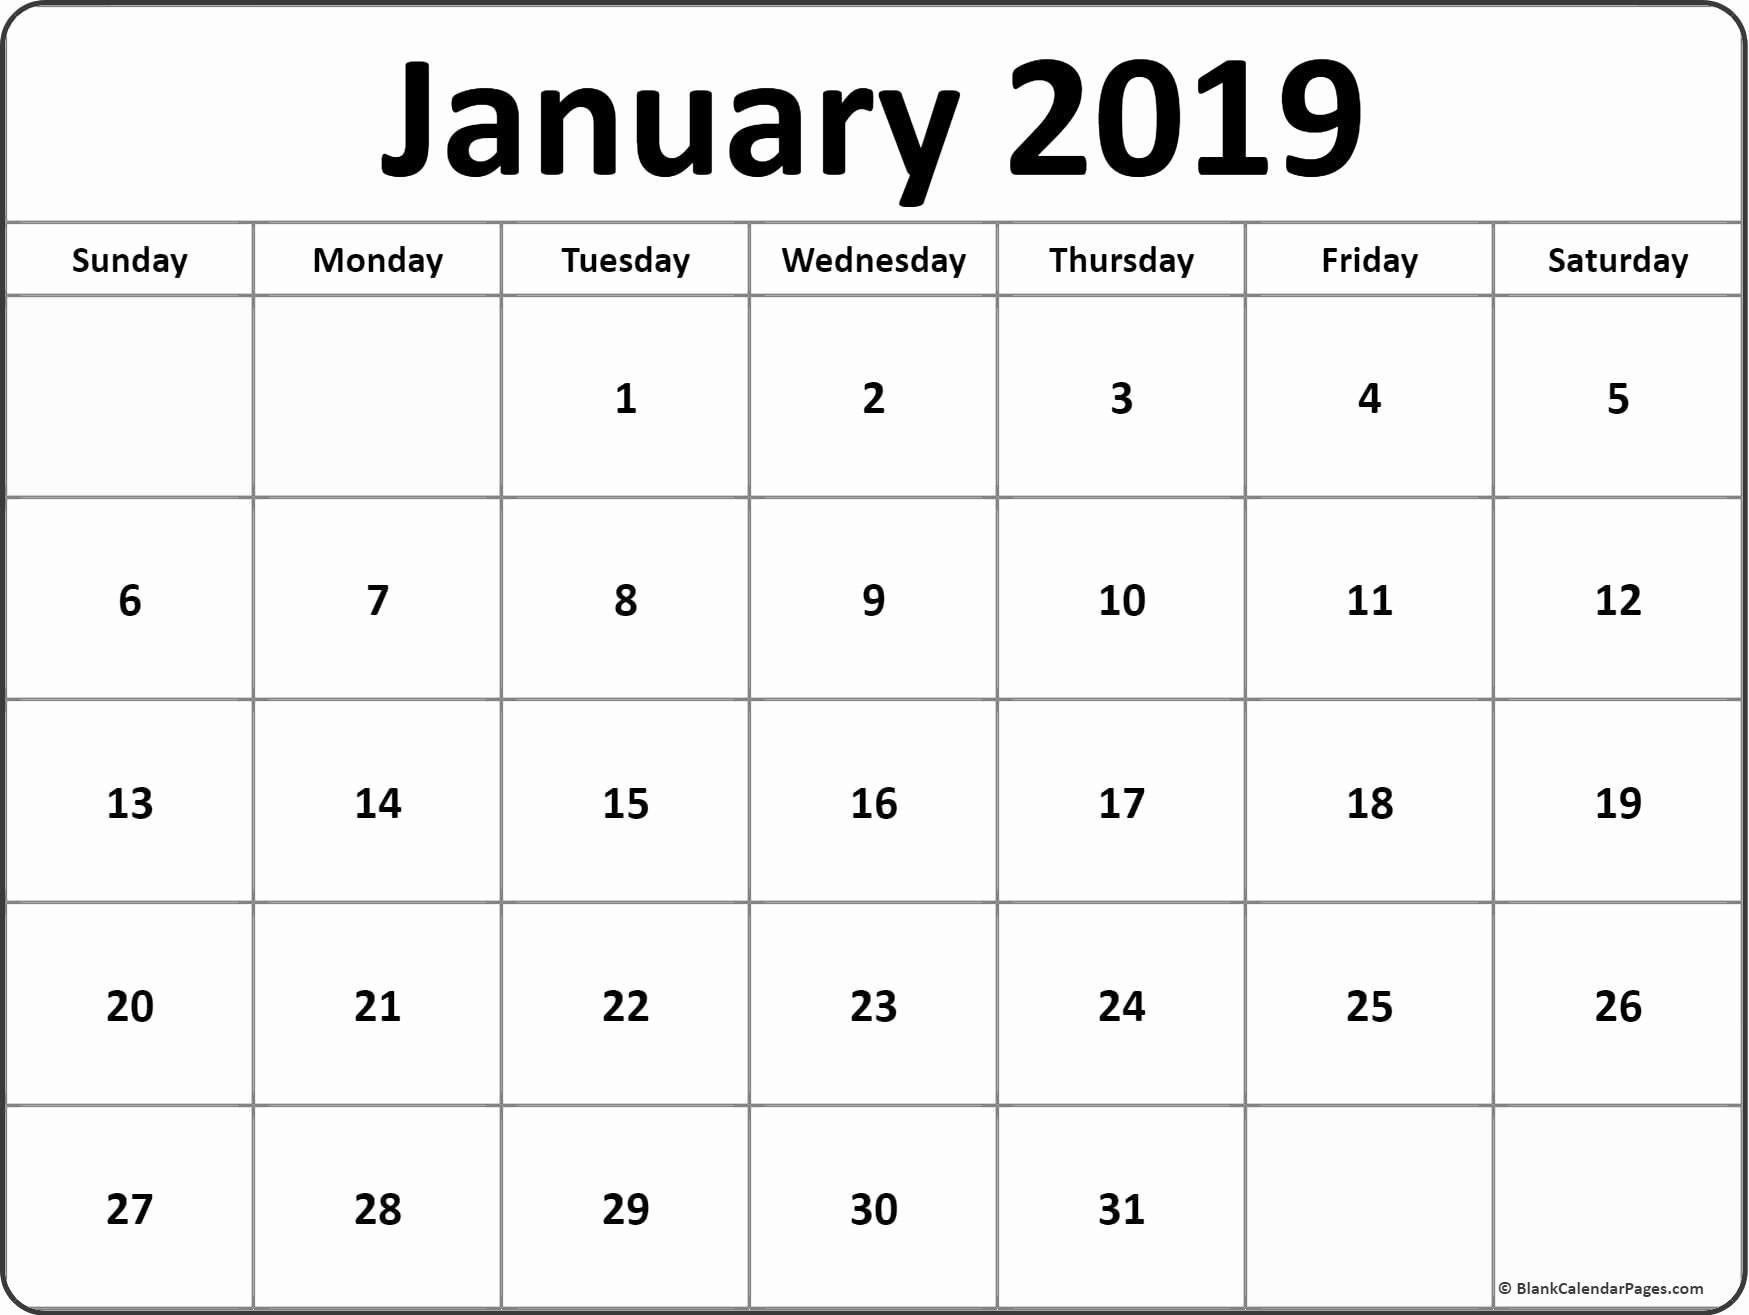 Blank January 2019 Calendar Template Fresh January 2019 Blank Calendar Templates